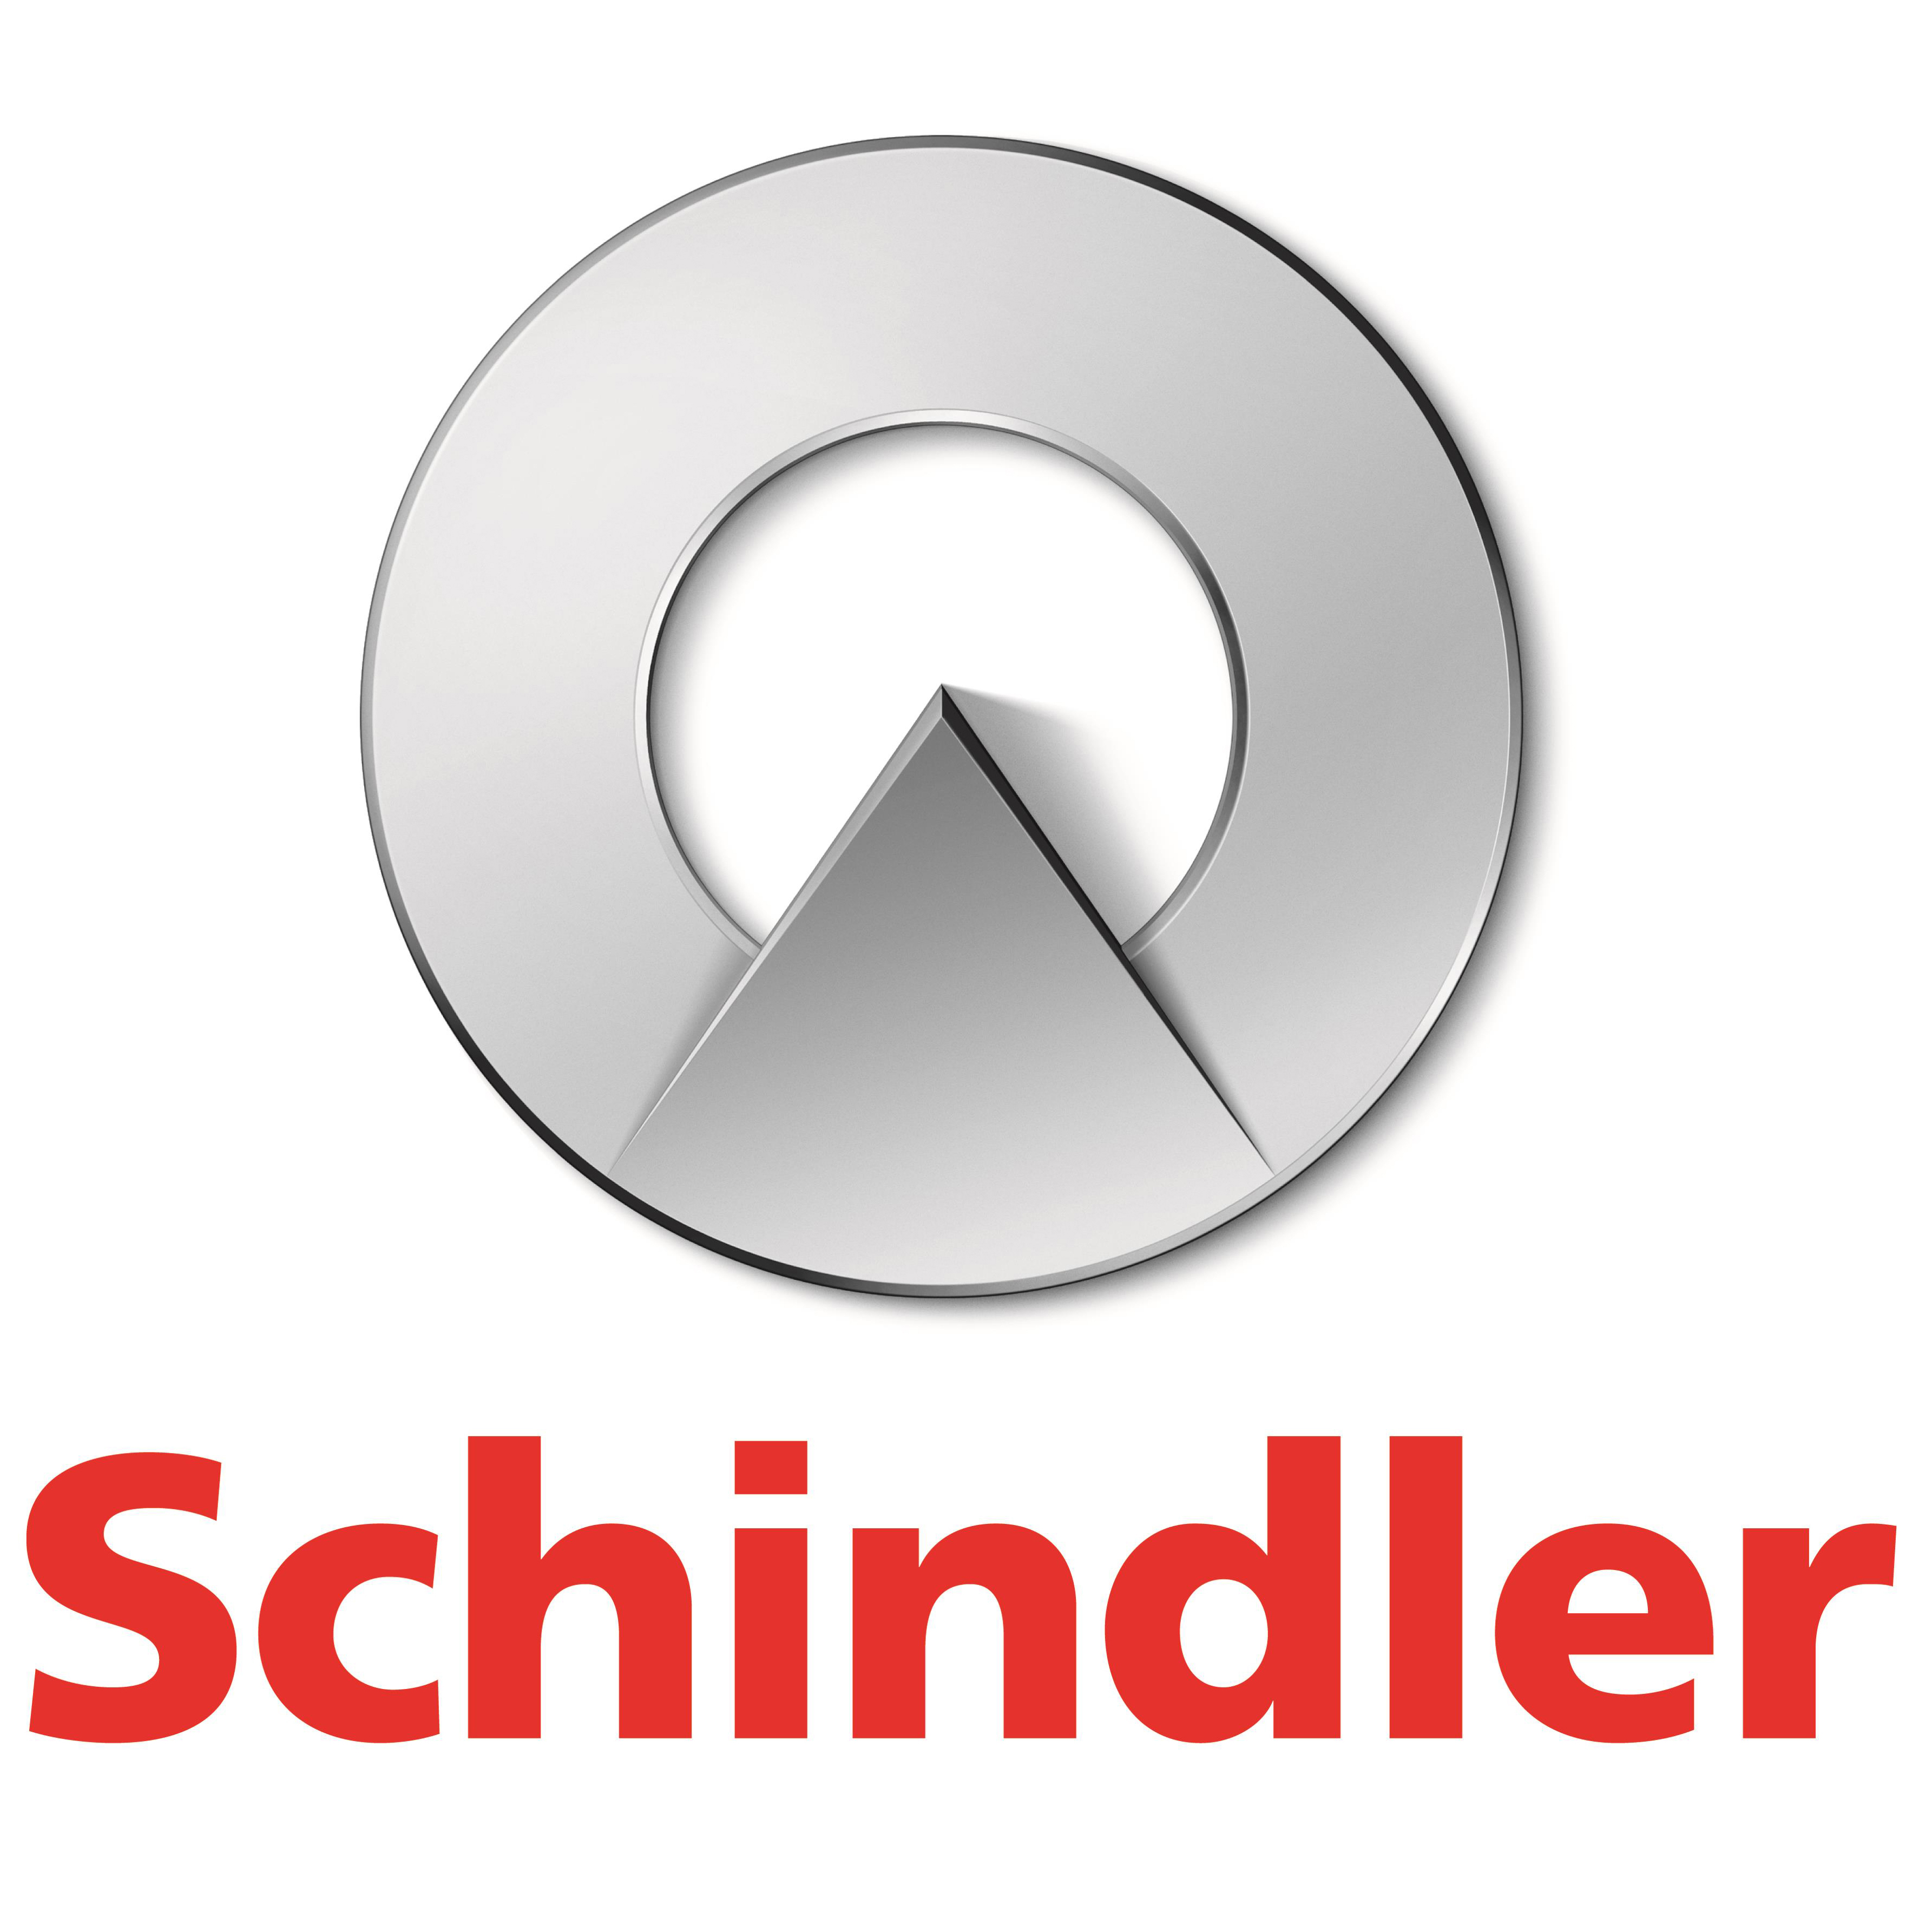 Myanmar Jardine Schindler Limited | CCI France Myanmar